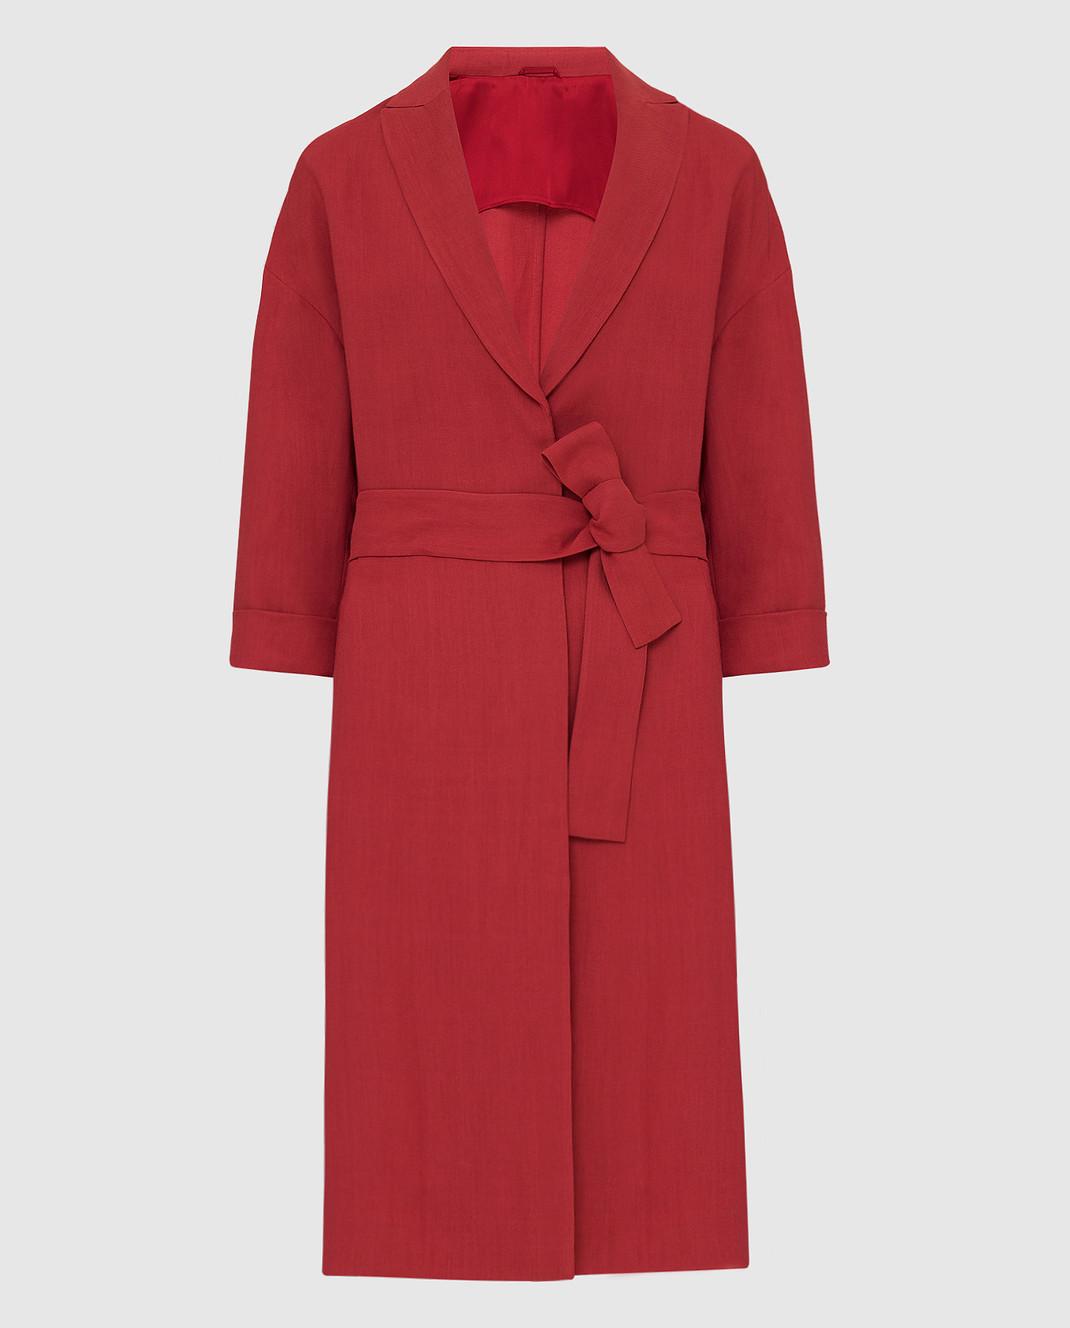 Brunello Cucinelli Красное пальто MH1269398